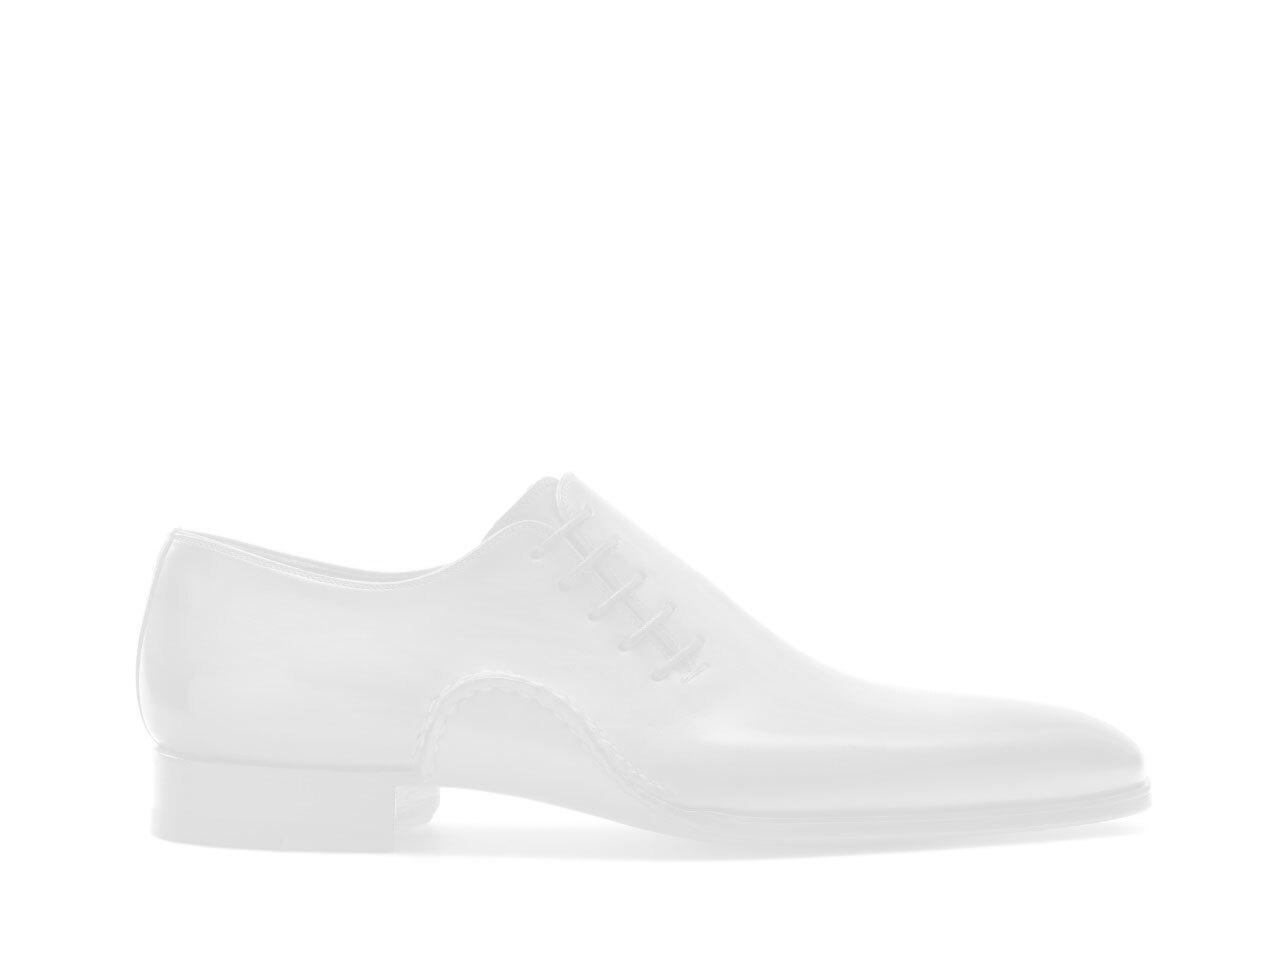 Pair of the Magnanni Marlow Cognac Men's Sneakers